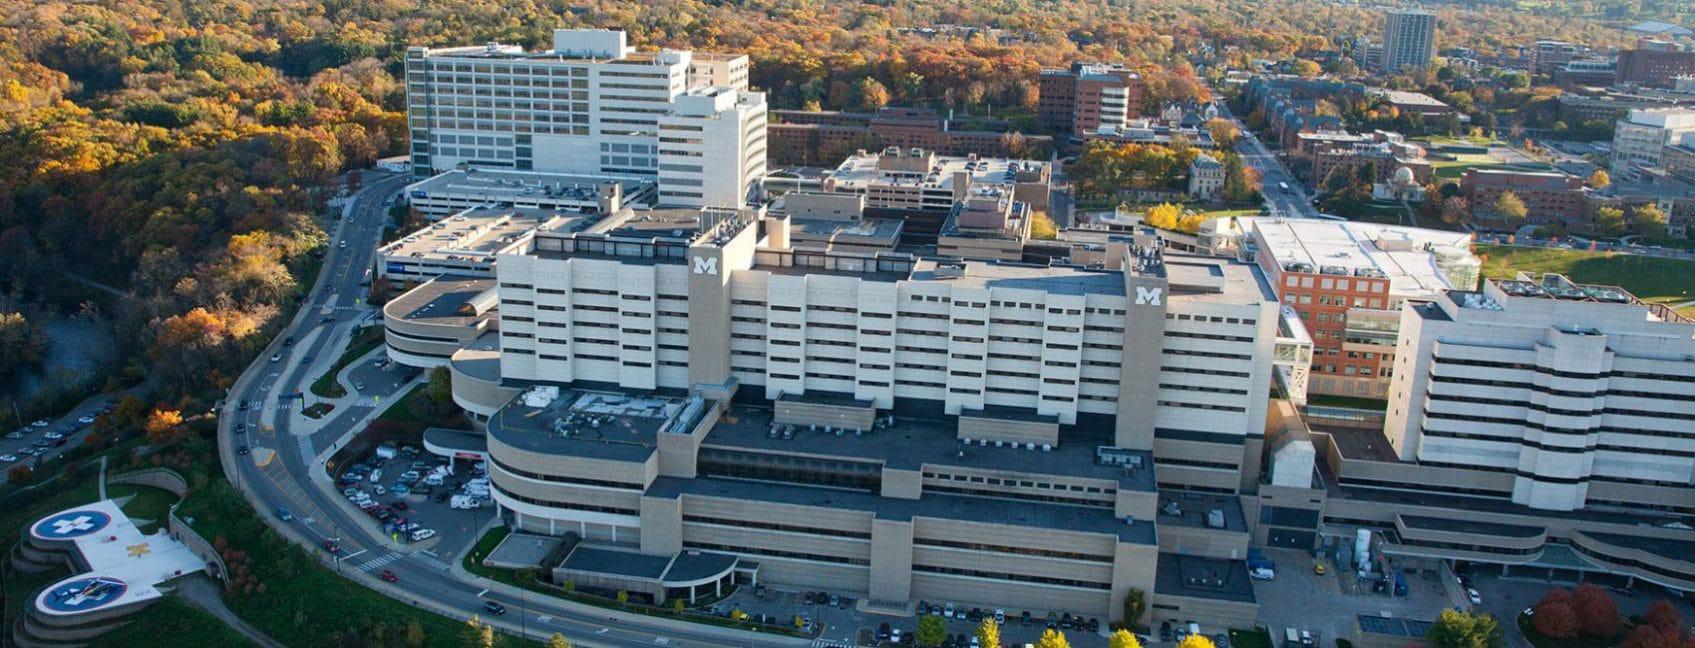 The University of Michigan Medical School